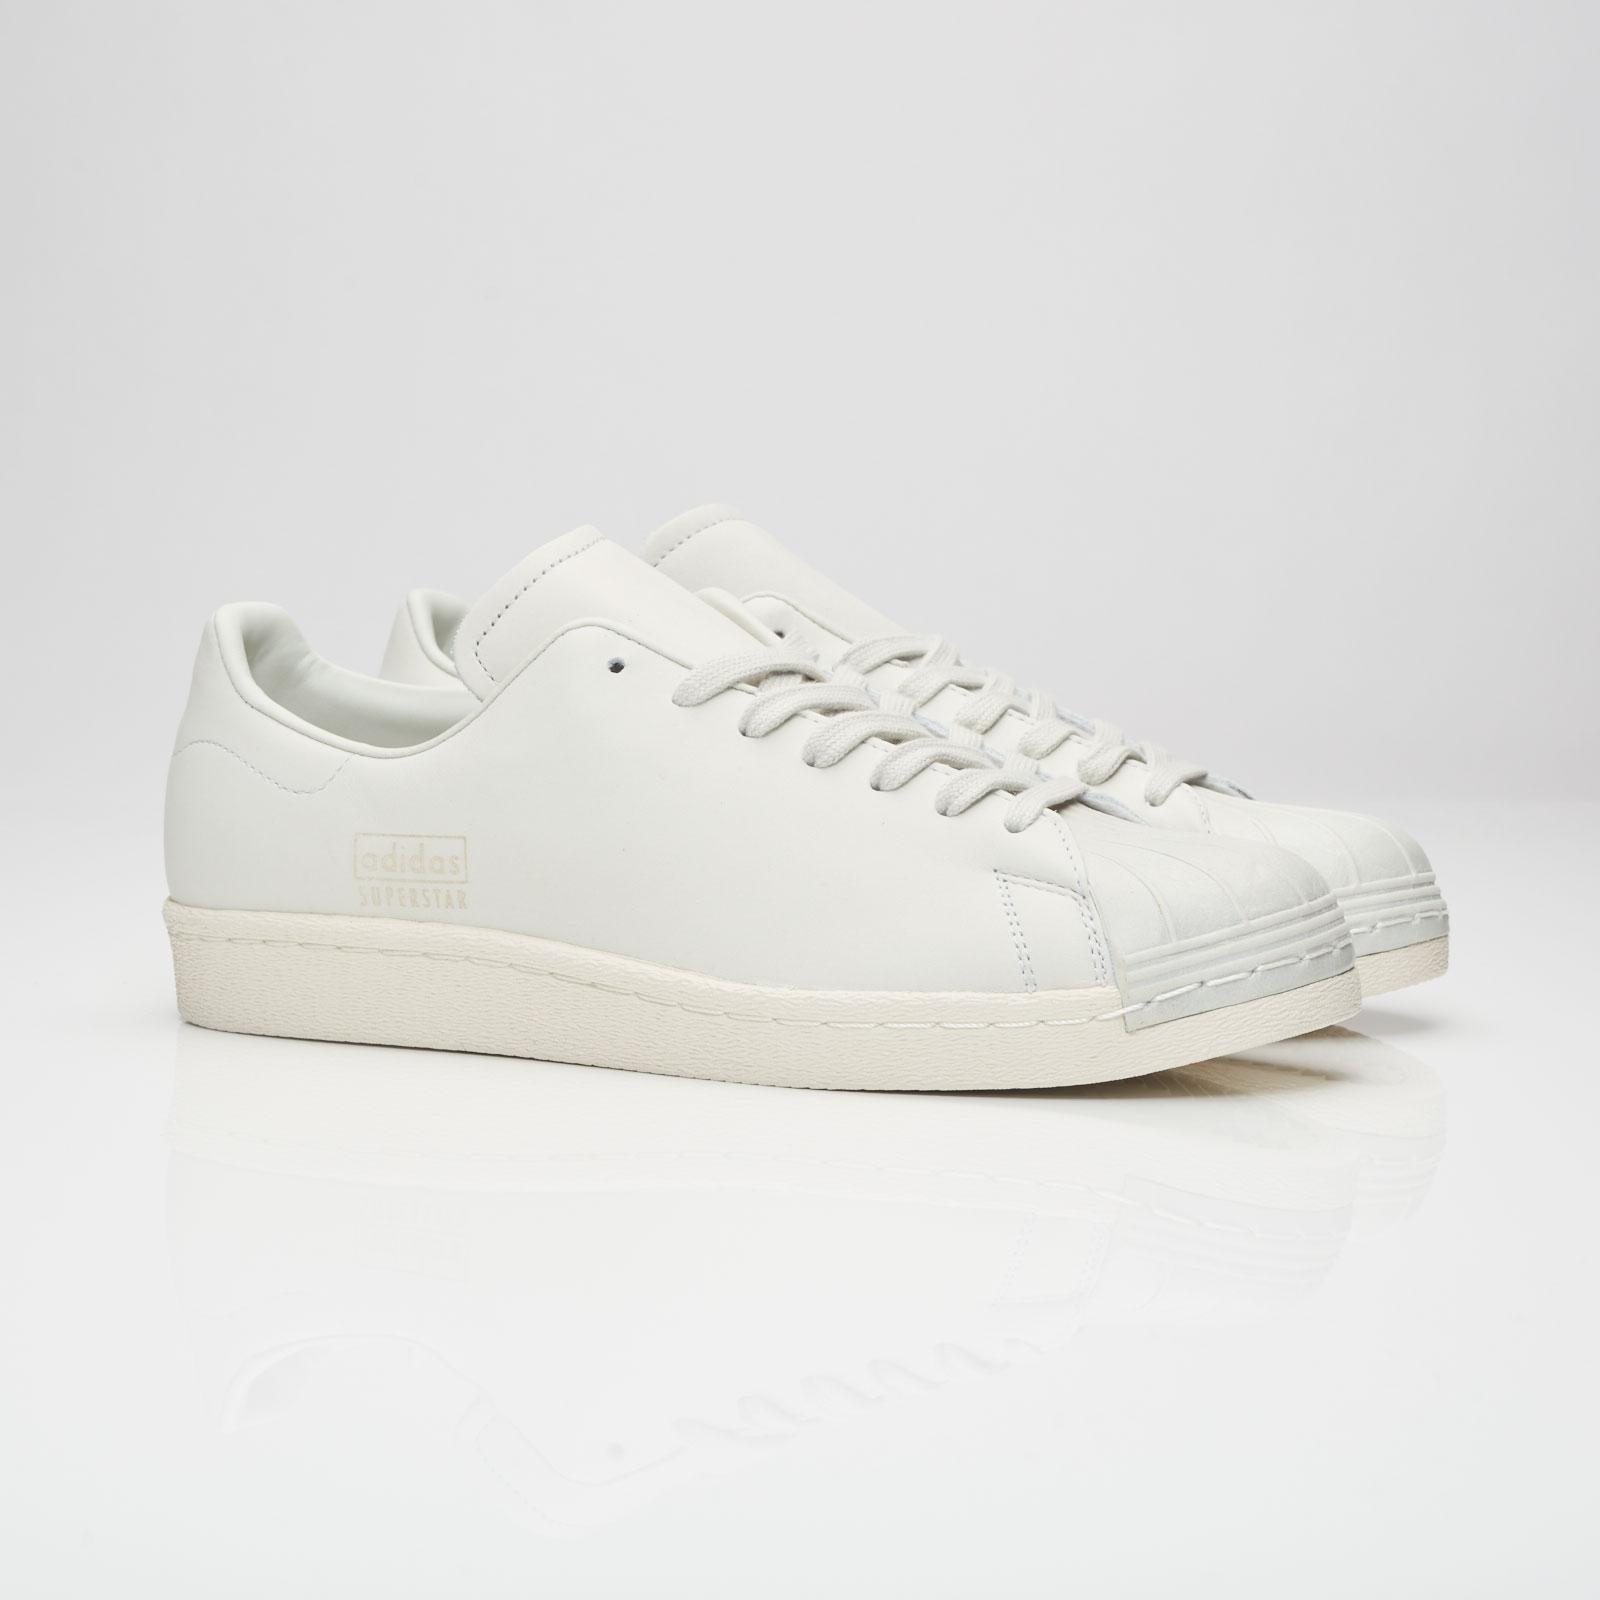 huge discount 87254 53b9d adidas Superstar 80S Clean - Bb0169 - Sneakersnstuff ...